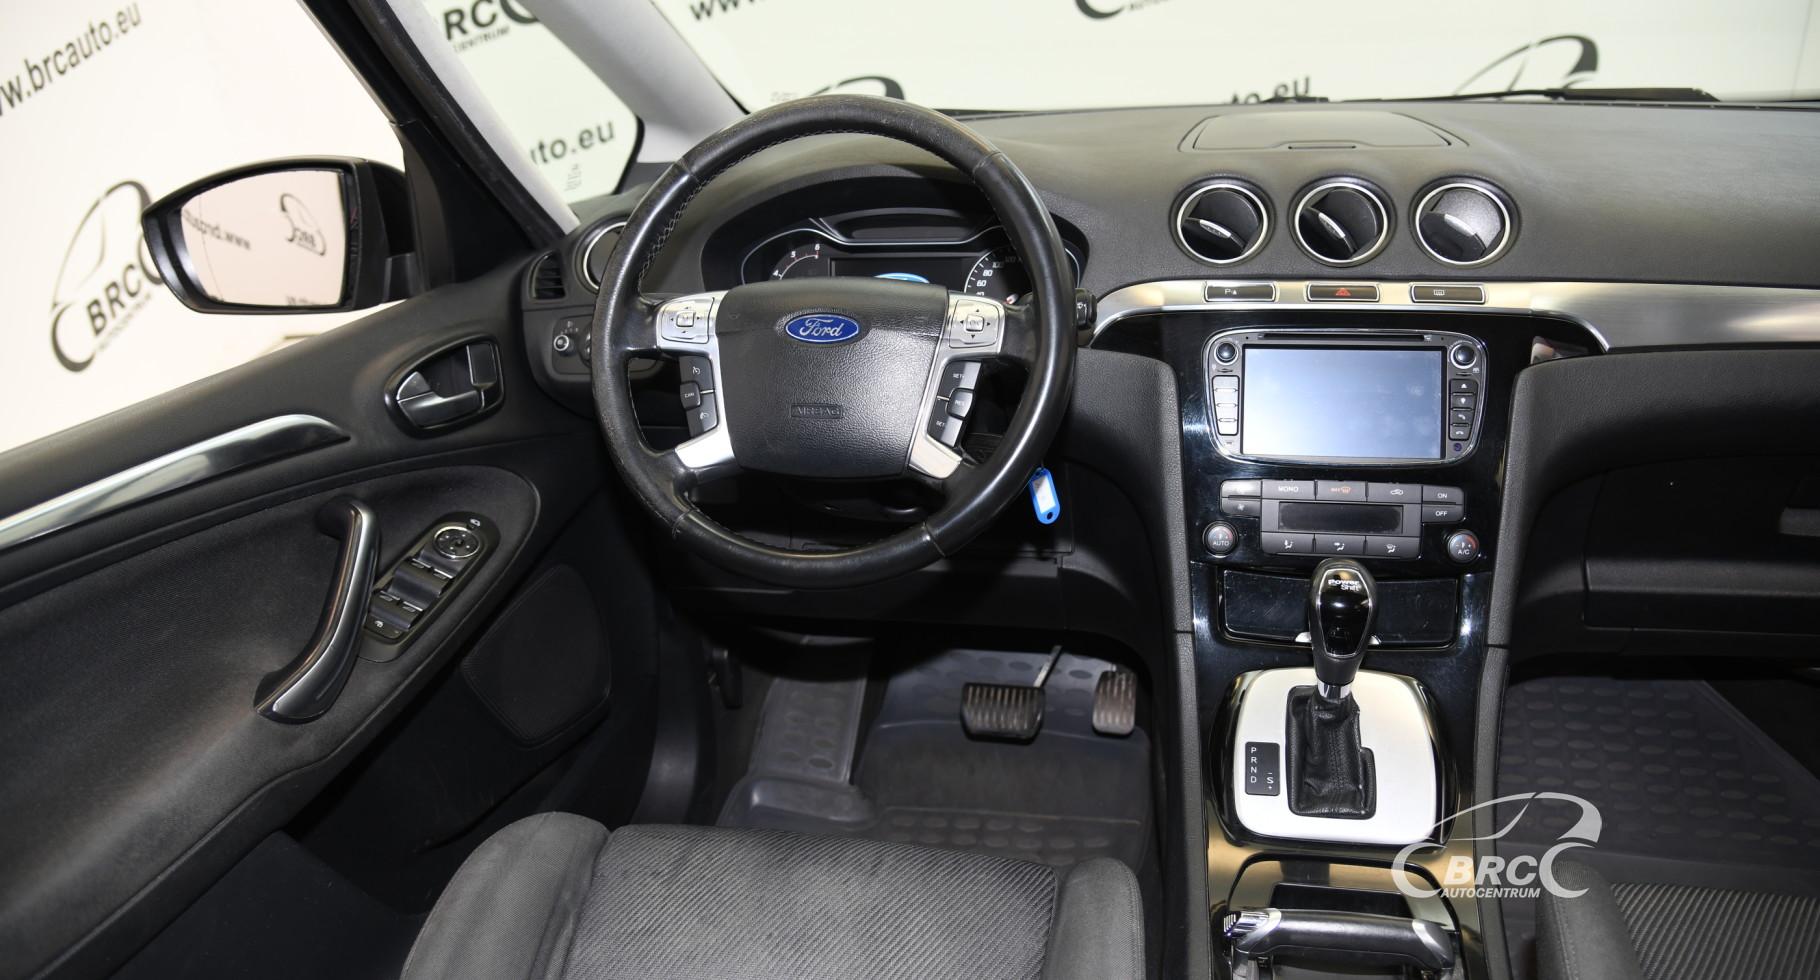 Ford S-Max 2.0 TDCi PowerShift Automatas